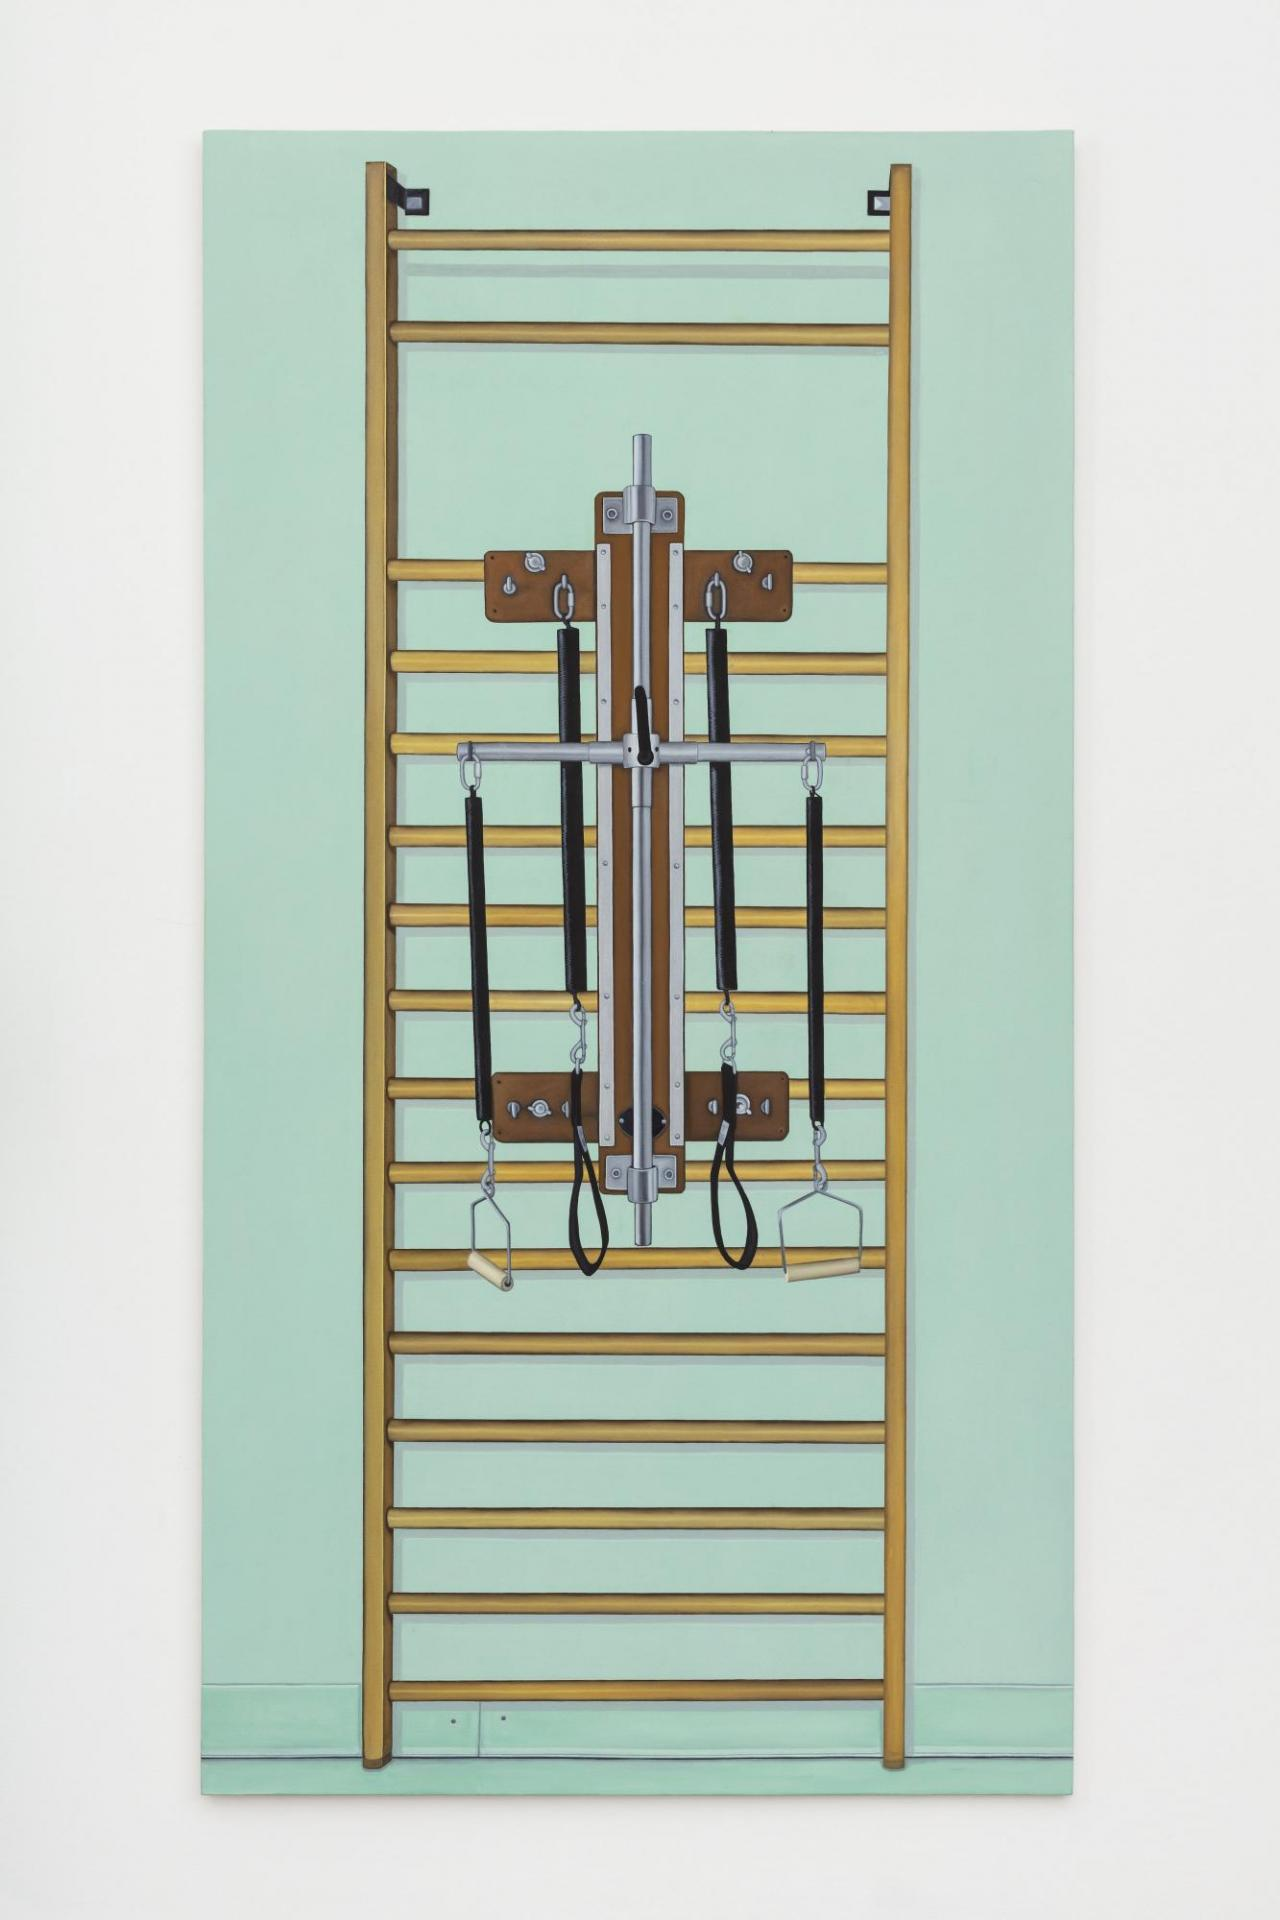 Megan Marrin, Swedish Bars with Register , 2021. Oil on canvas on styrofoam, 231 × 121 cm. Courtesy: the artist; Queer Thoughts, New York; Efremidis, Berlin